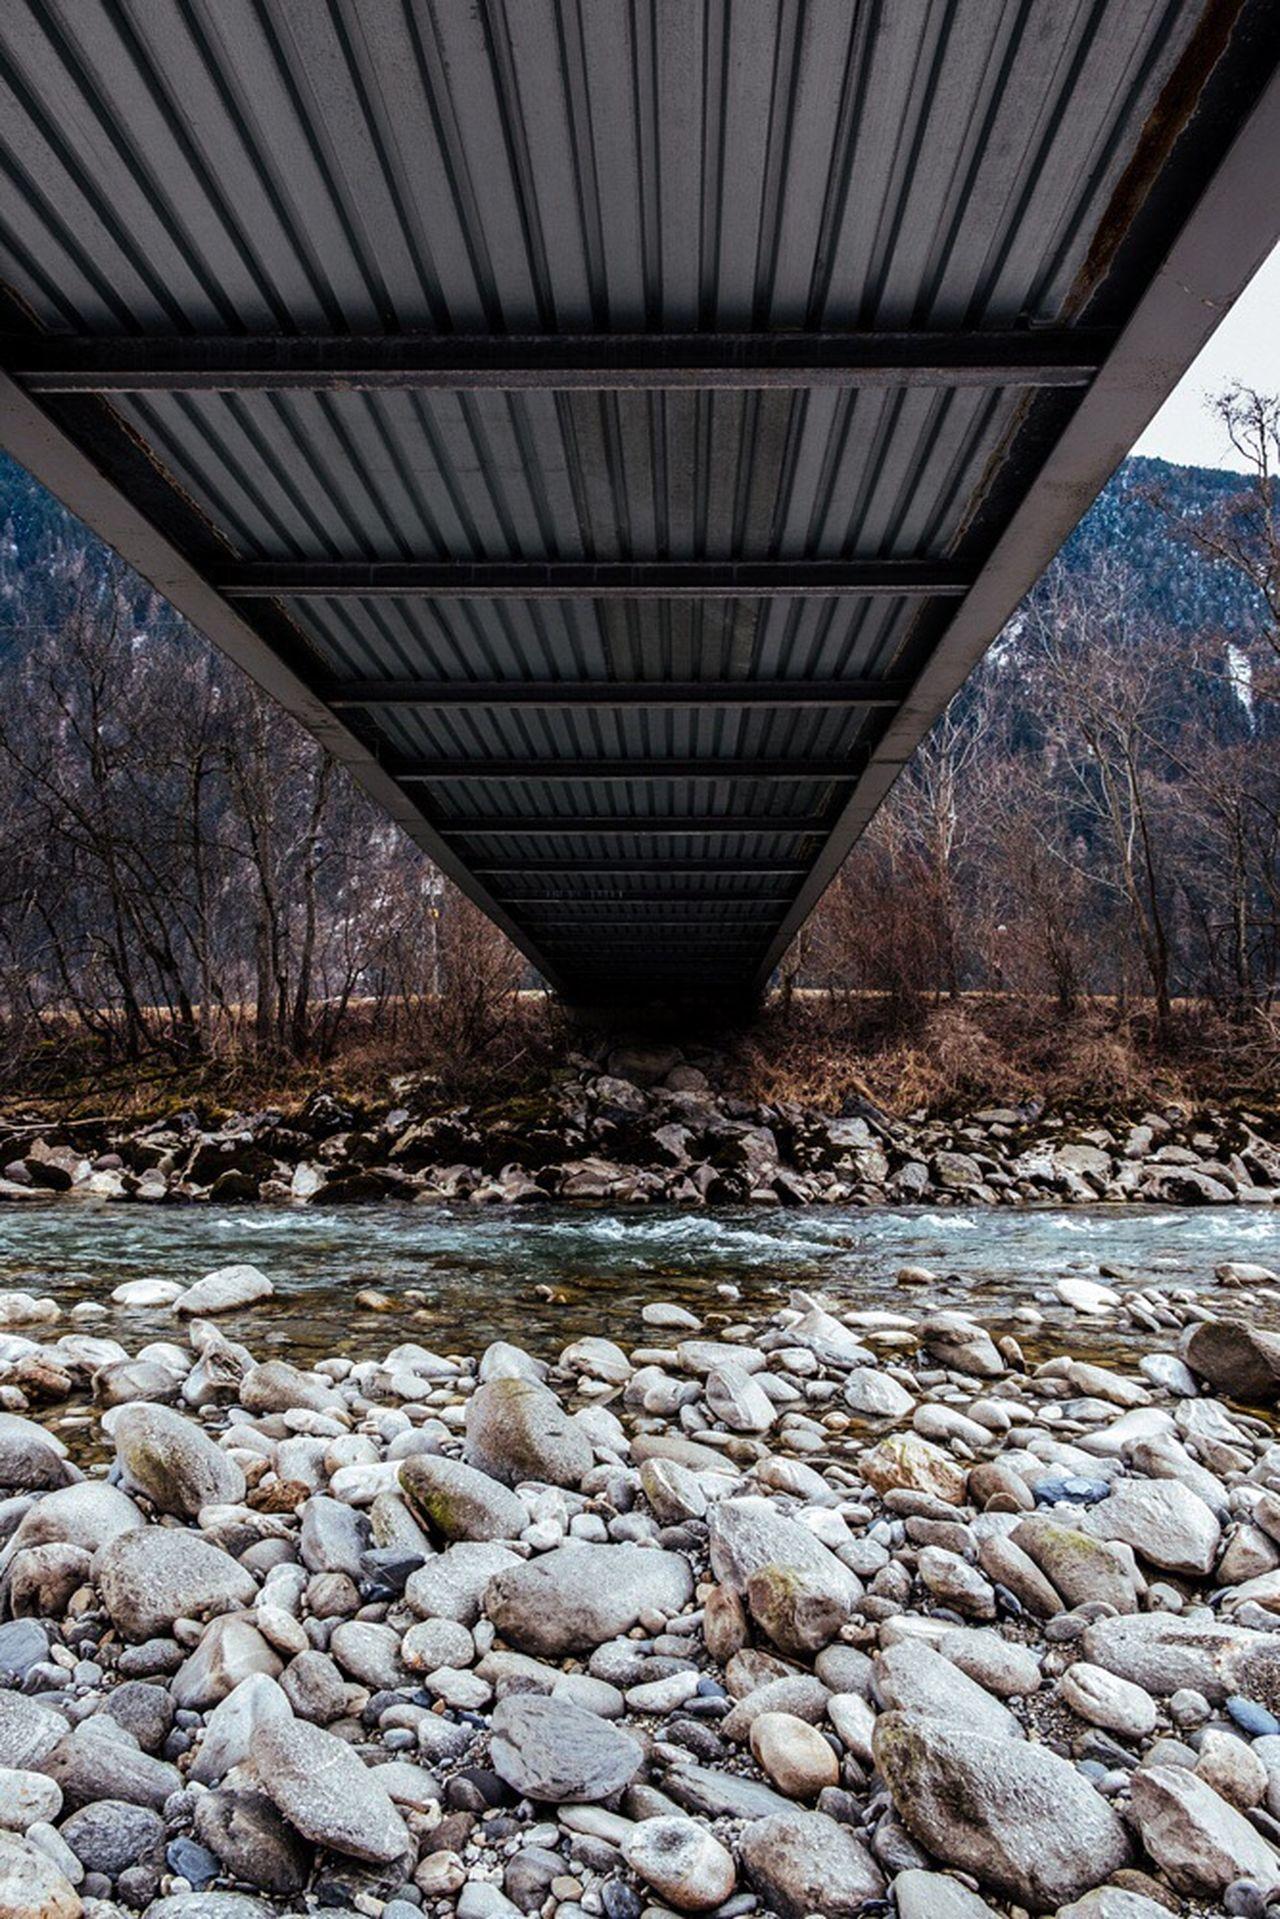 Bridge - Man Made Structure Connection Transportation Outdoors Day Nature No People Tree Architecture Underneath Alps Nature Architecture Built Structure EyeEm Best Shots Bridge POV